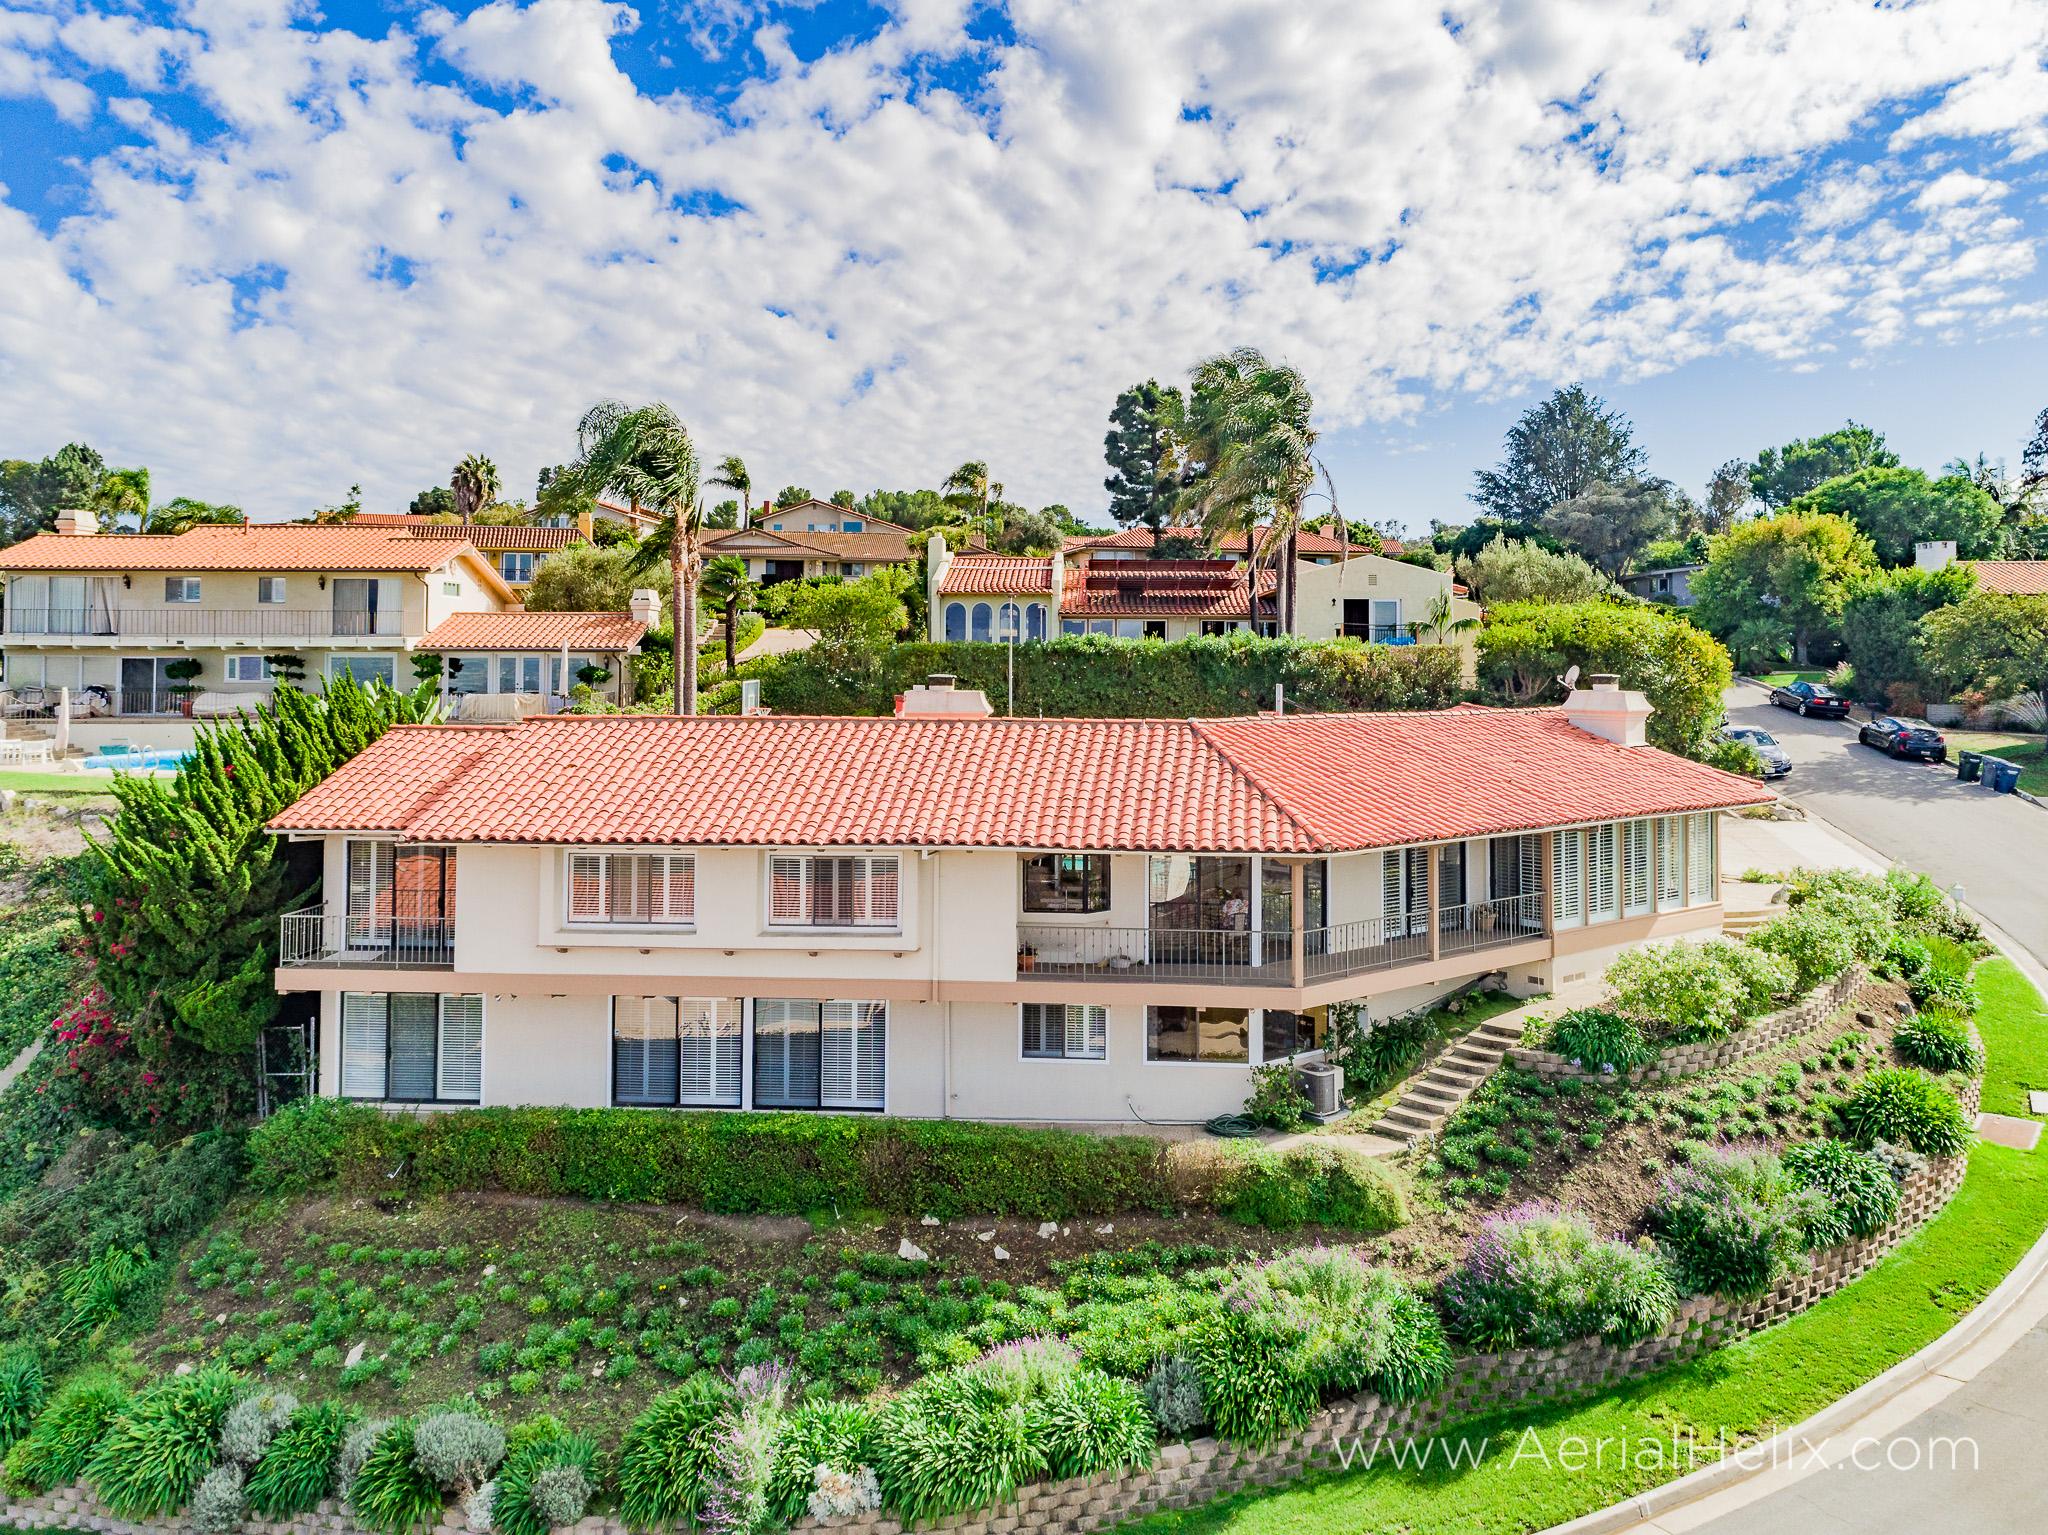 Woodfern Drive - HELIX Real Estate Aerial Photographer-13.jpg